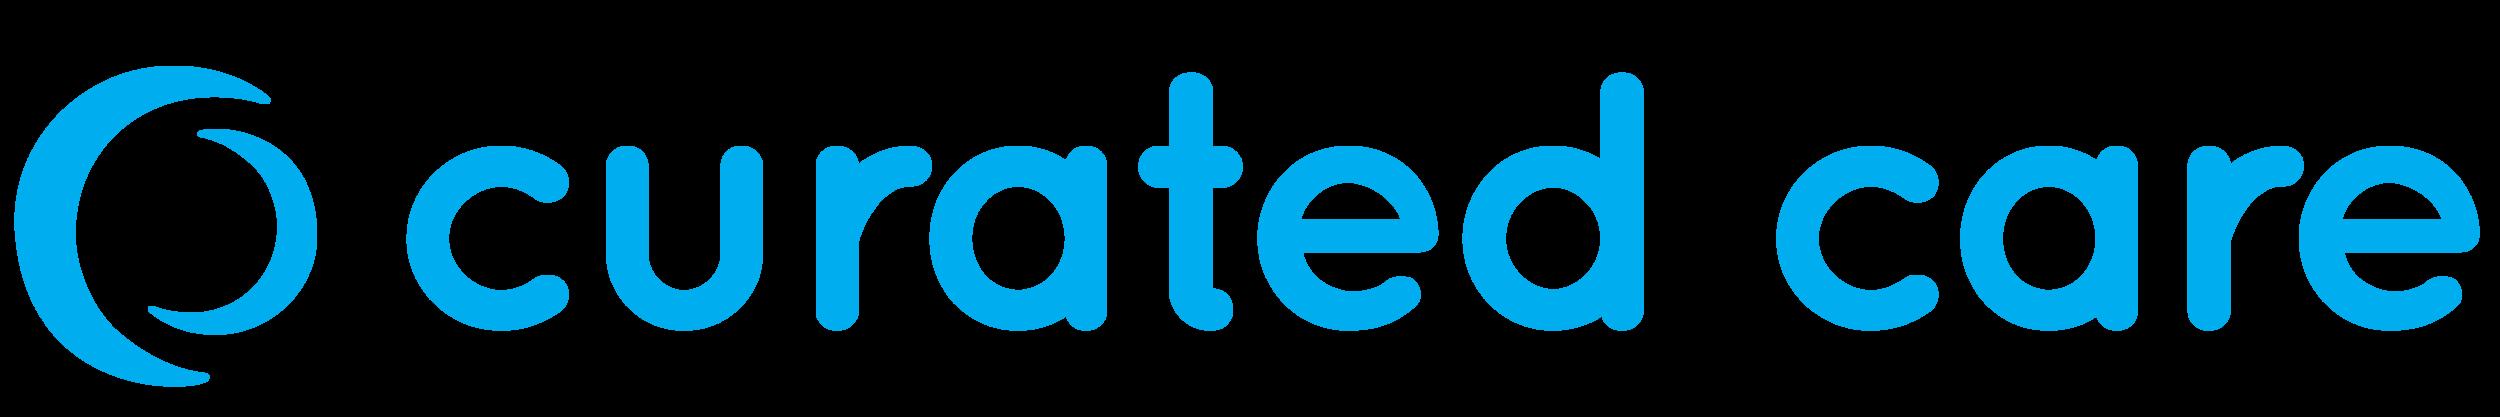 CC-logo_CC-logo-BBLUE.png